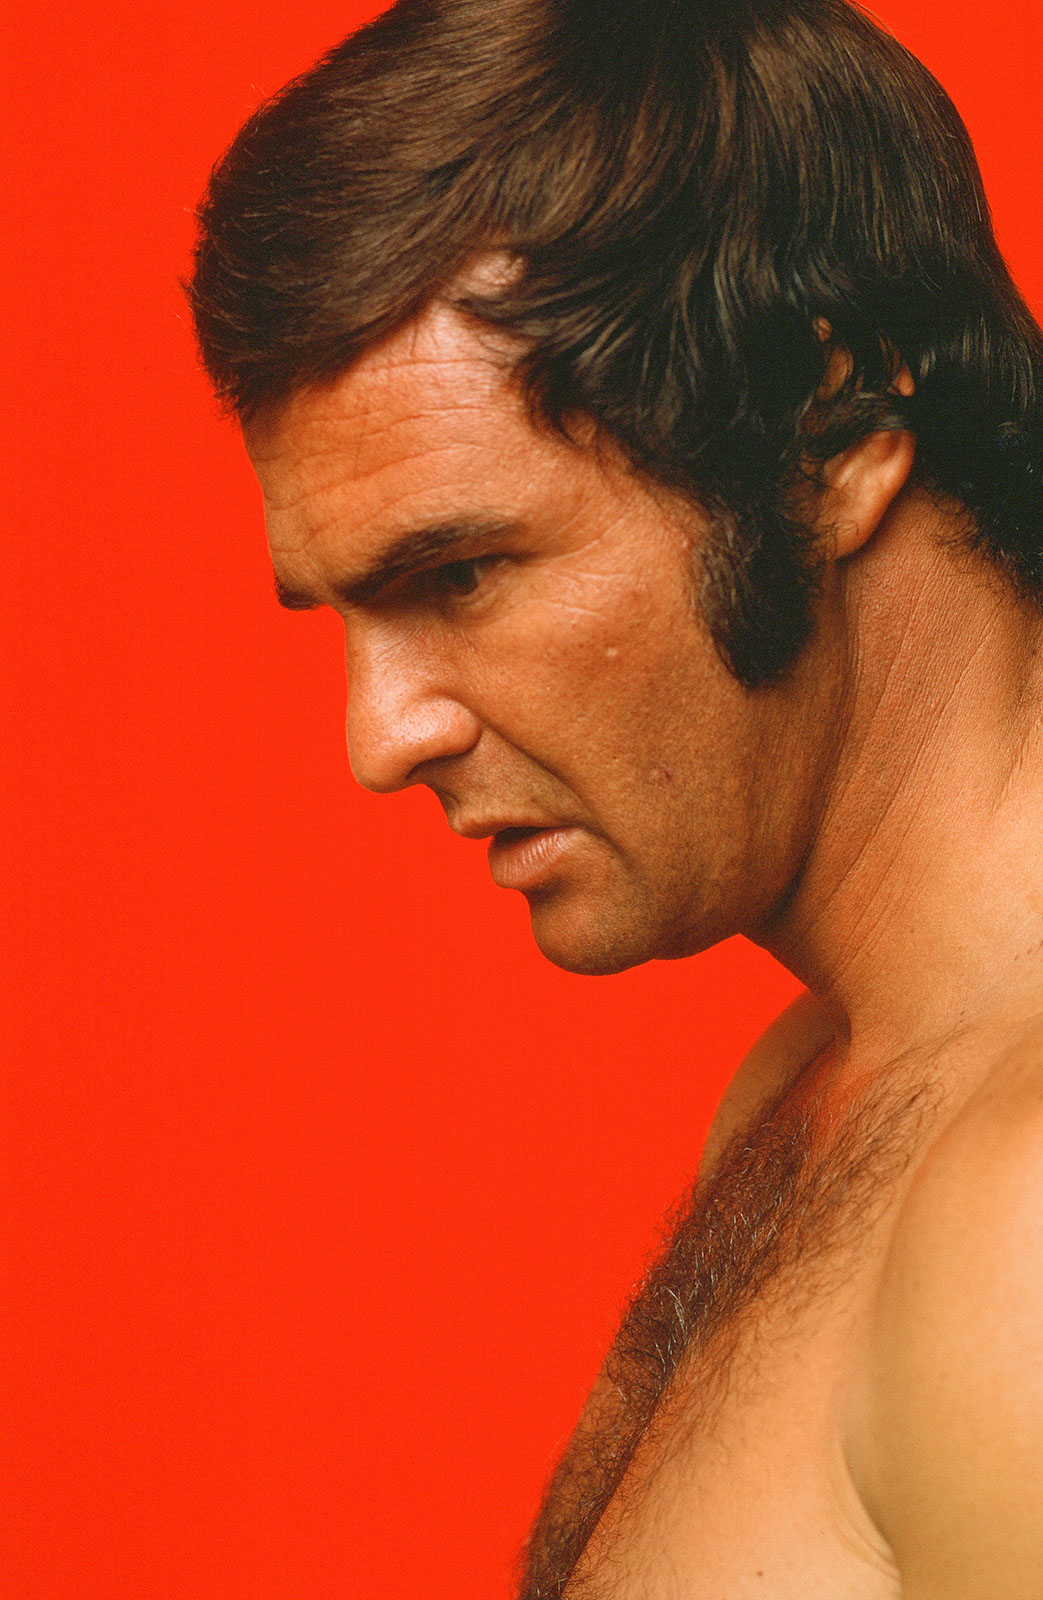 Burt Reynolds, 1972